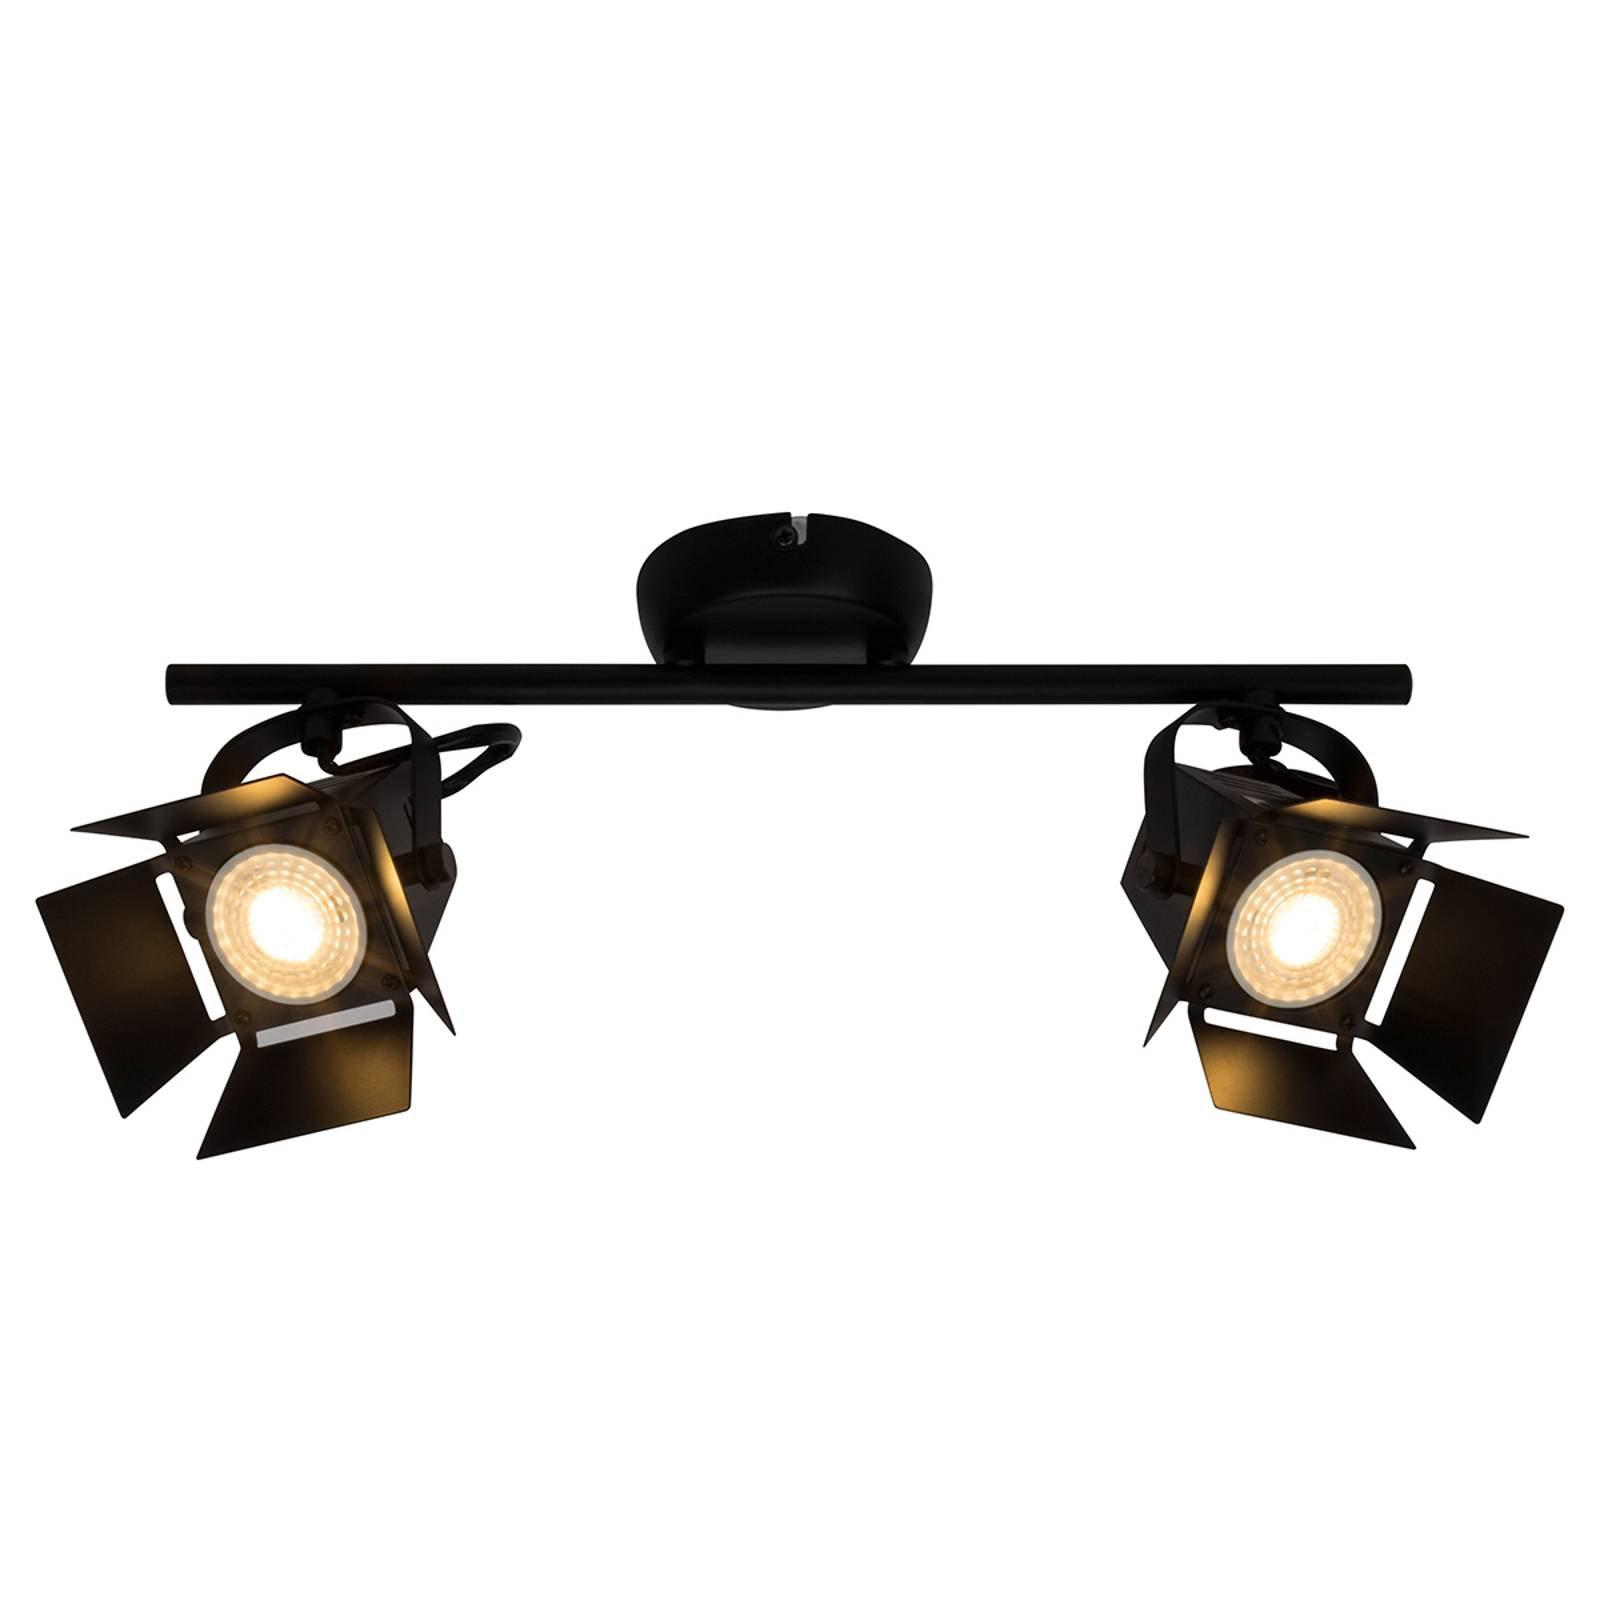 2 lyskilder LED spot taklampe Movie, svart